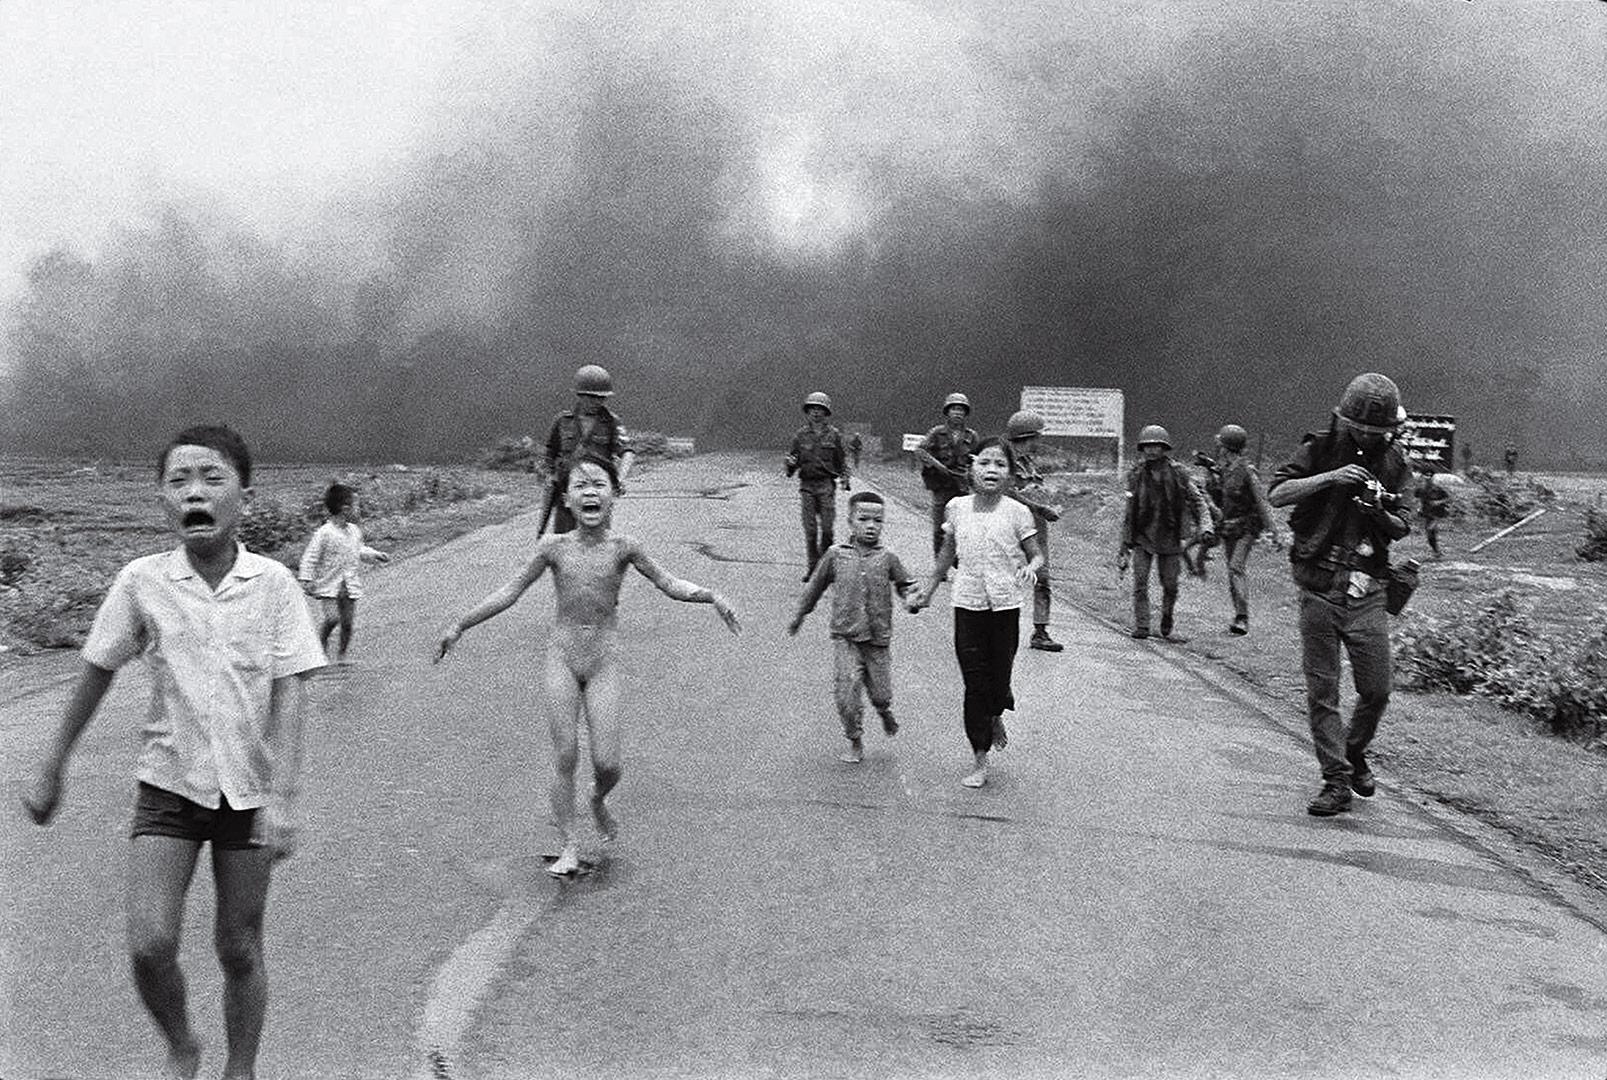 The Terror of War (Nick Ut/Time)